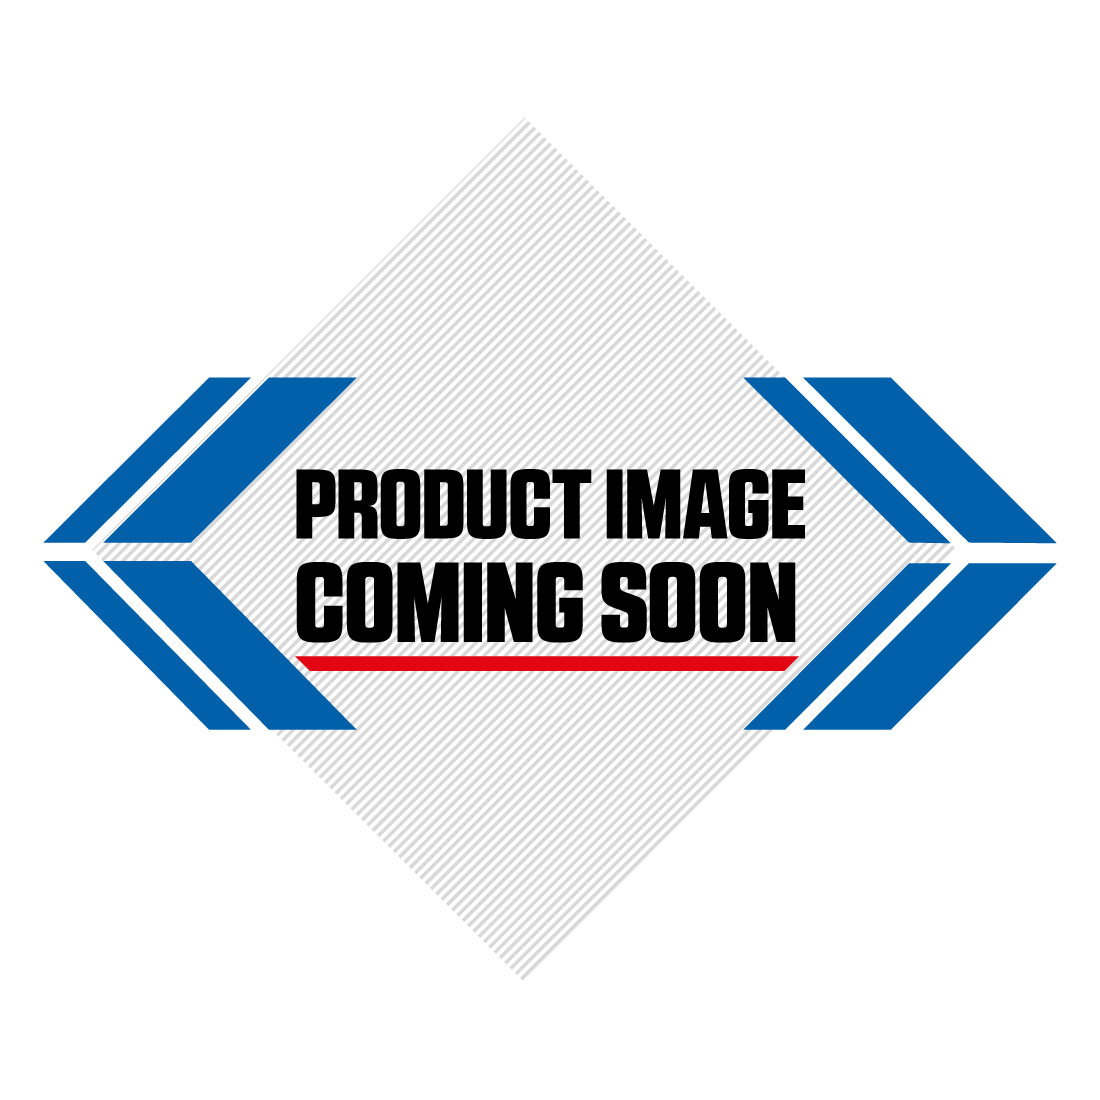 Kawasaki Restyled Plastic Kit KX 85 (01-09) (11-12) OEM Factory Image-2>